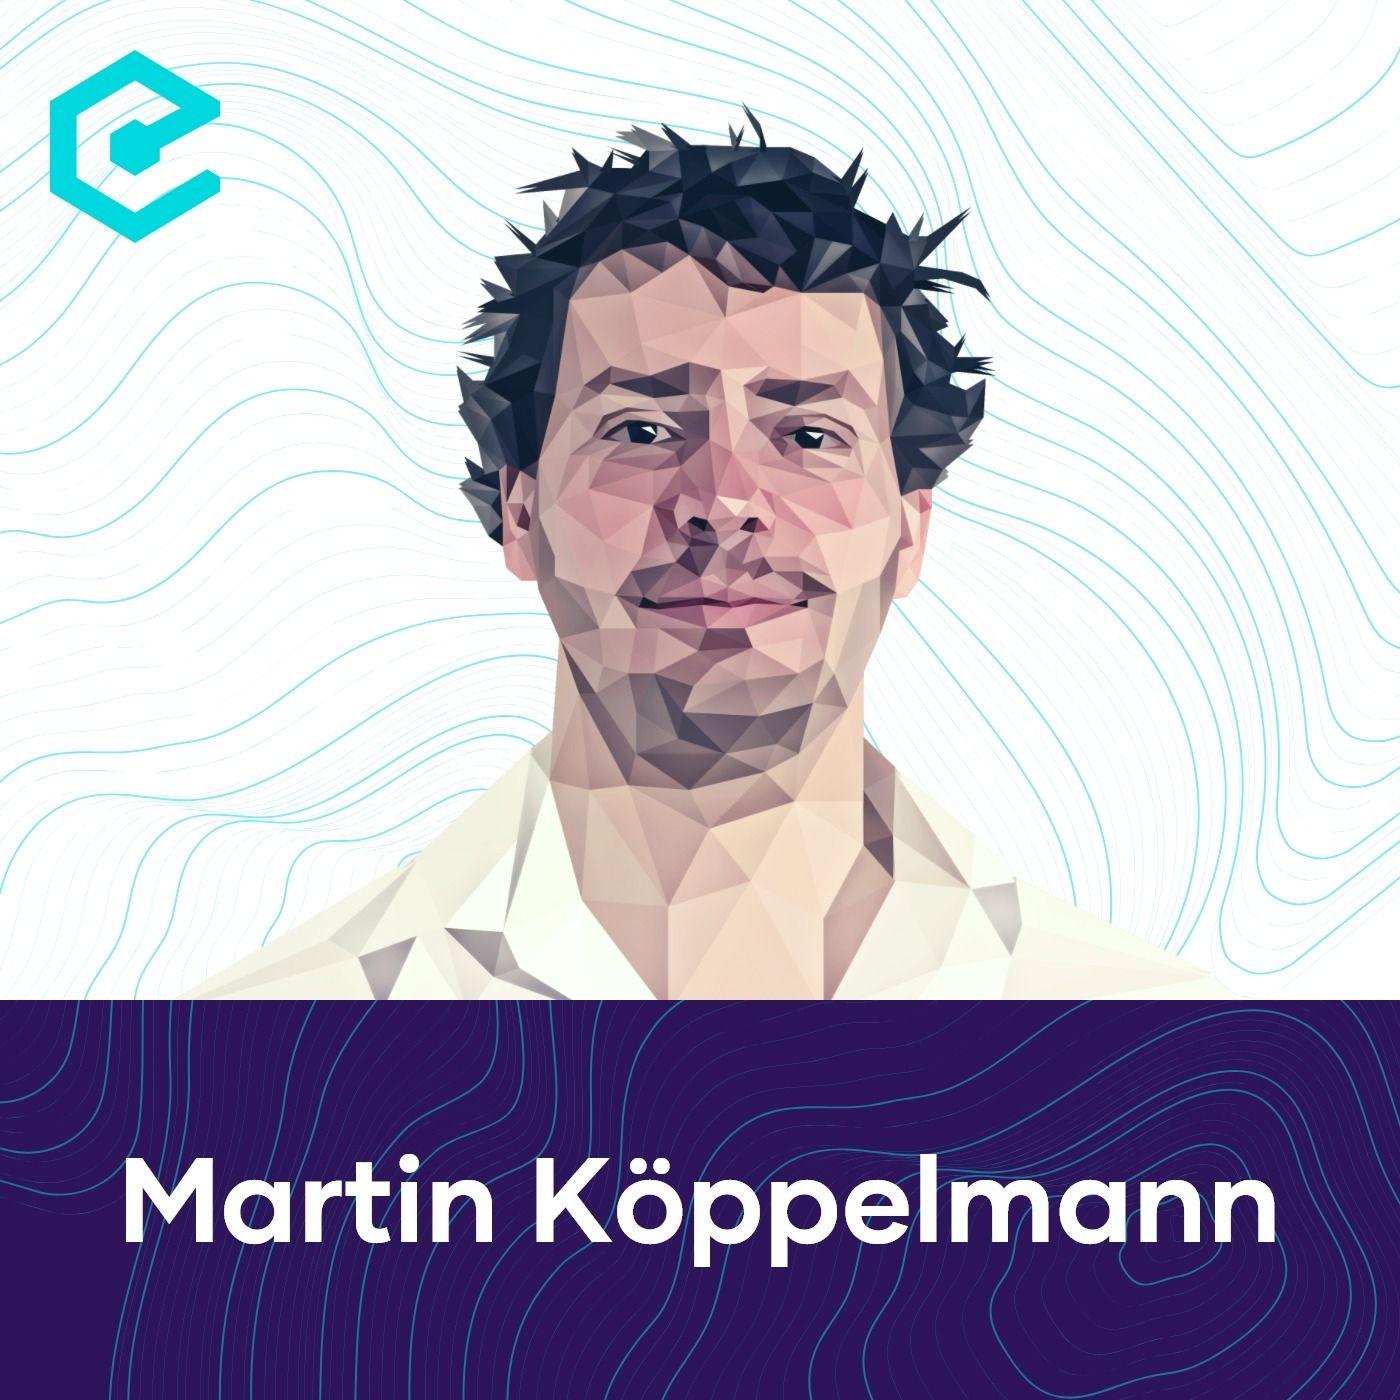 Martin Köppelmann: Circles – Creating Universal Basic Income Economies for Everyone